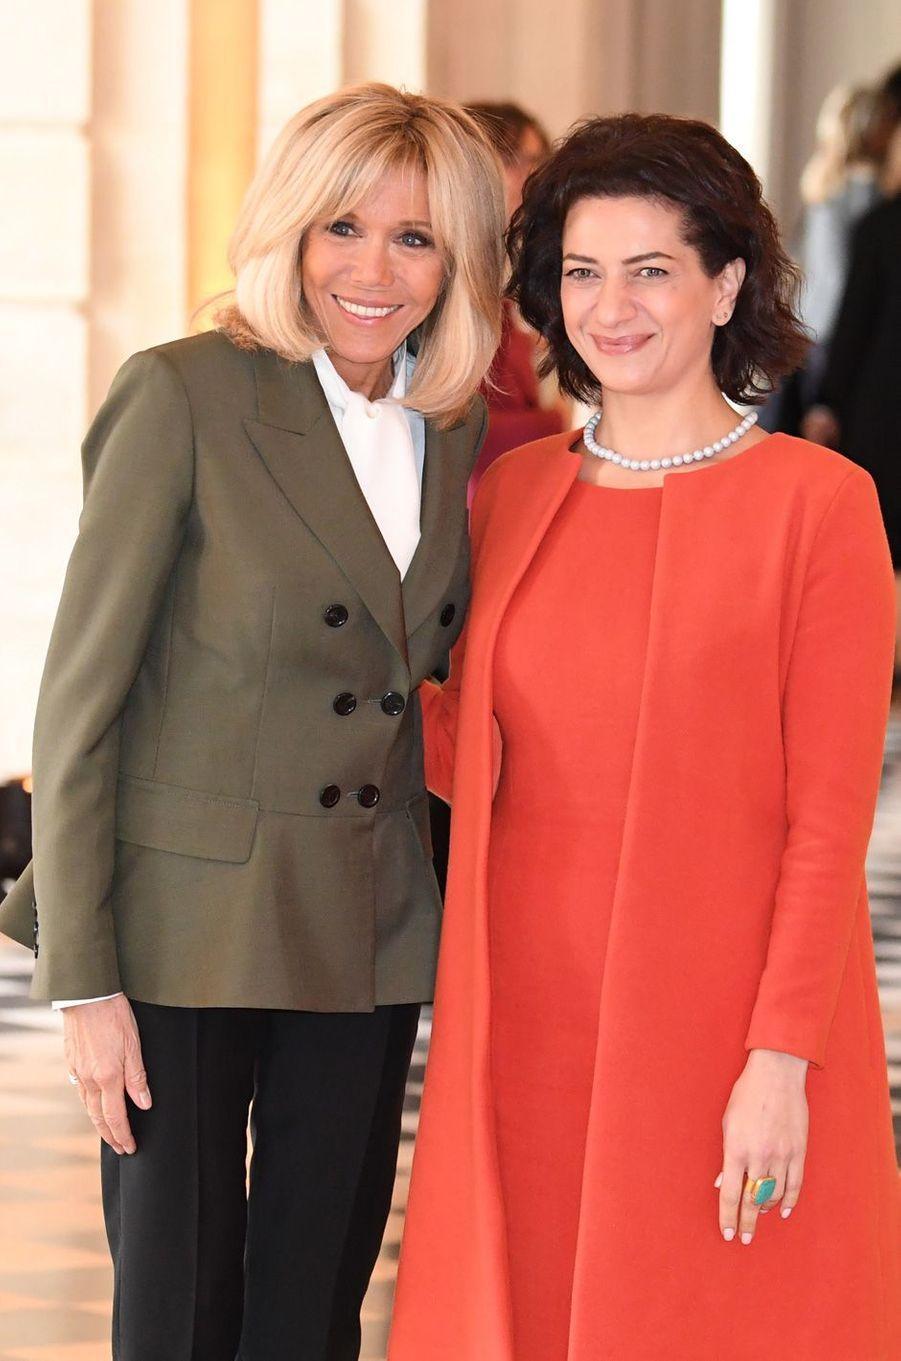 AvecAnna Hakobyan, épouse duPremier ministre d'Arménie, Nikol Pashinyan.